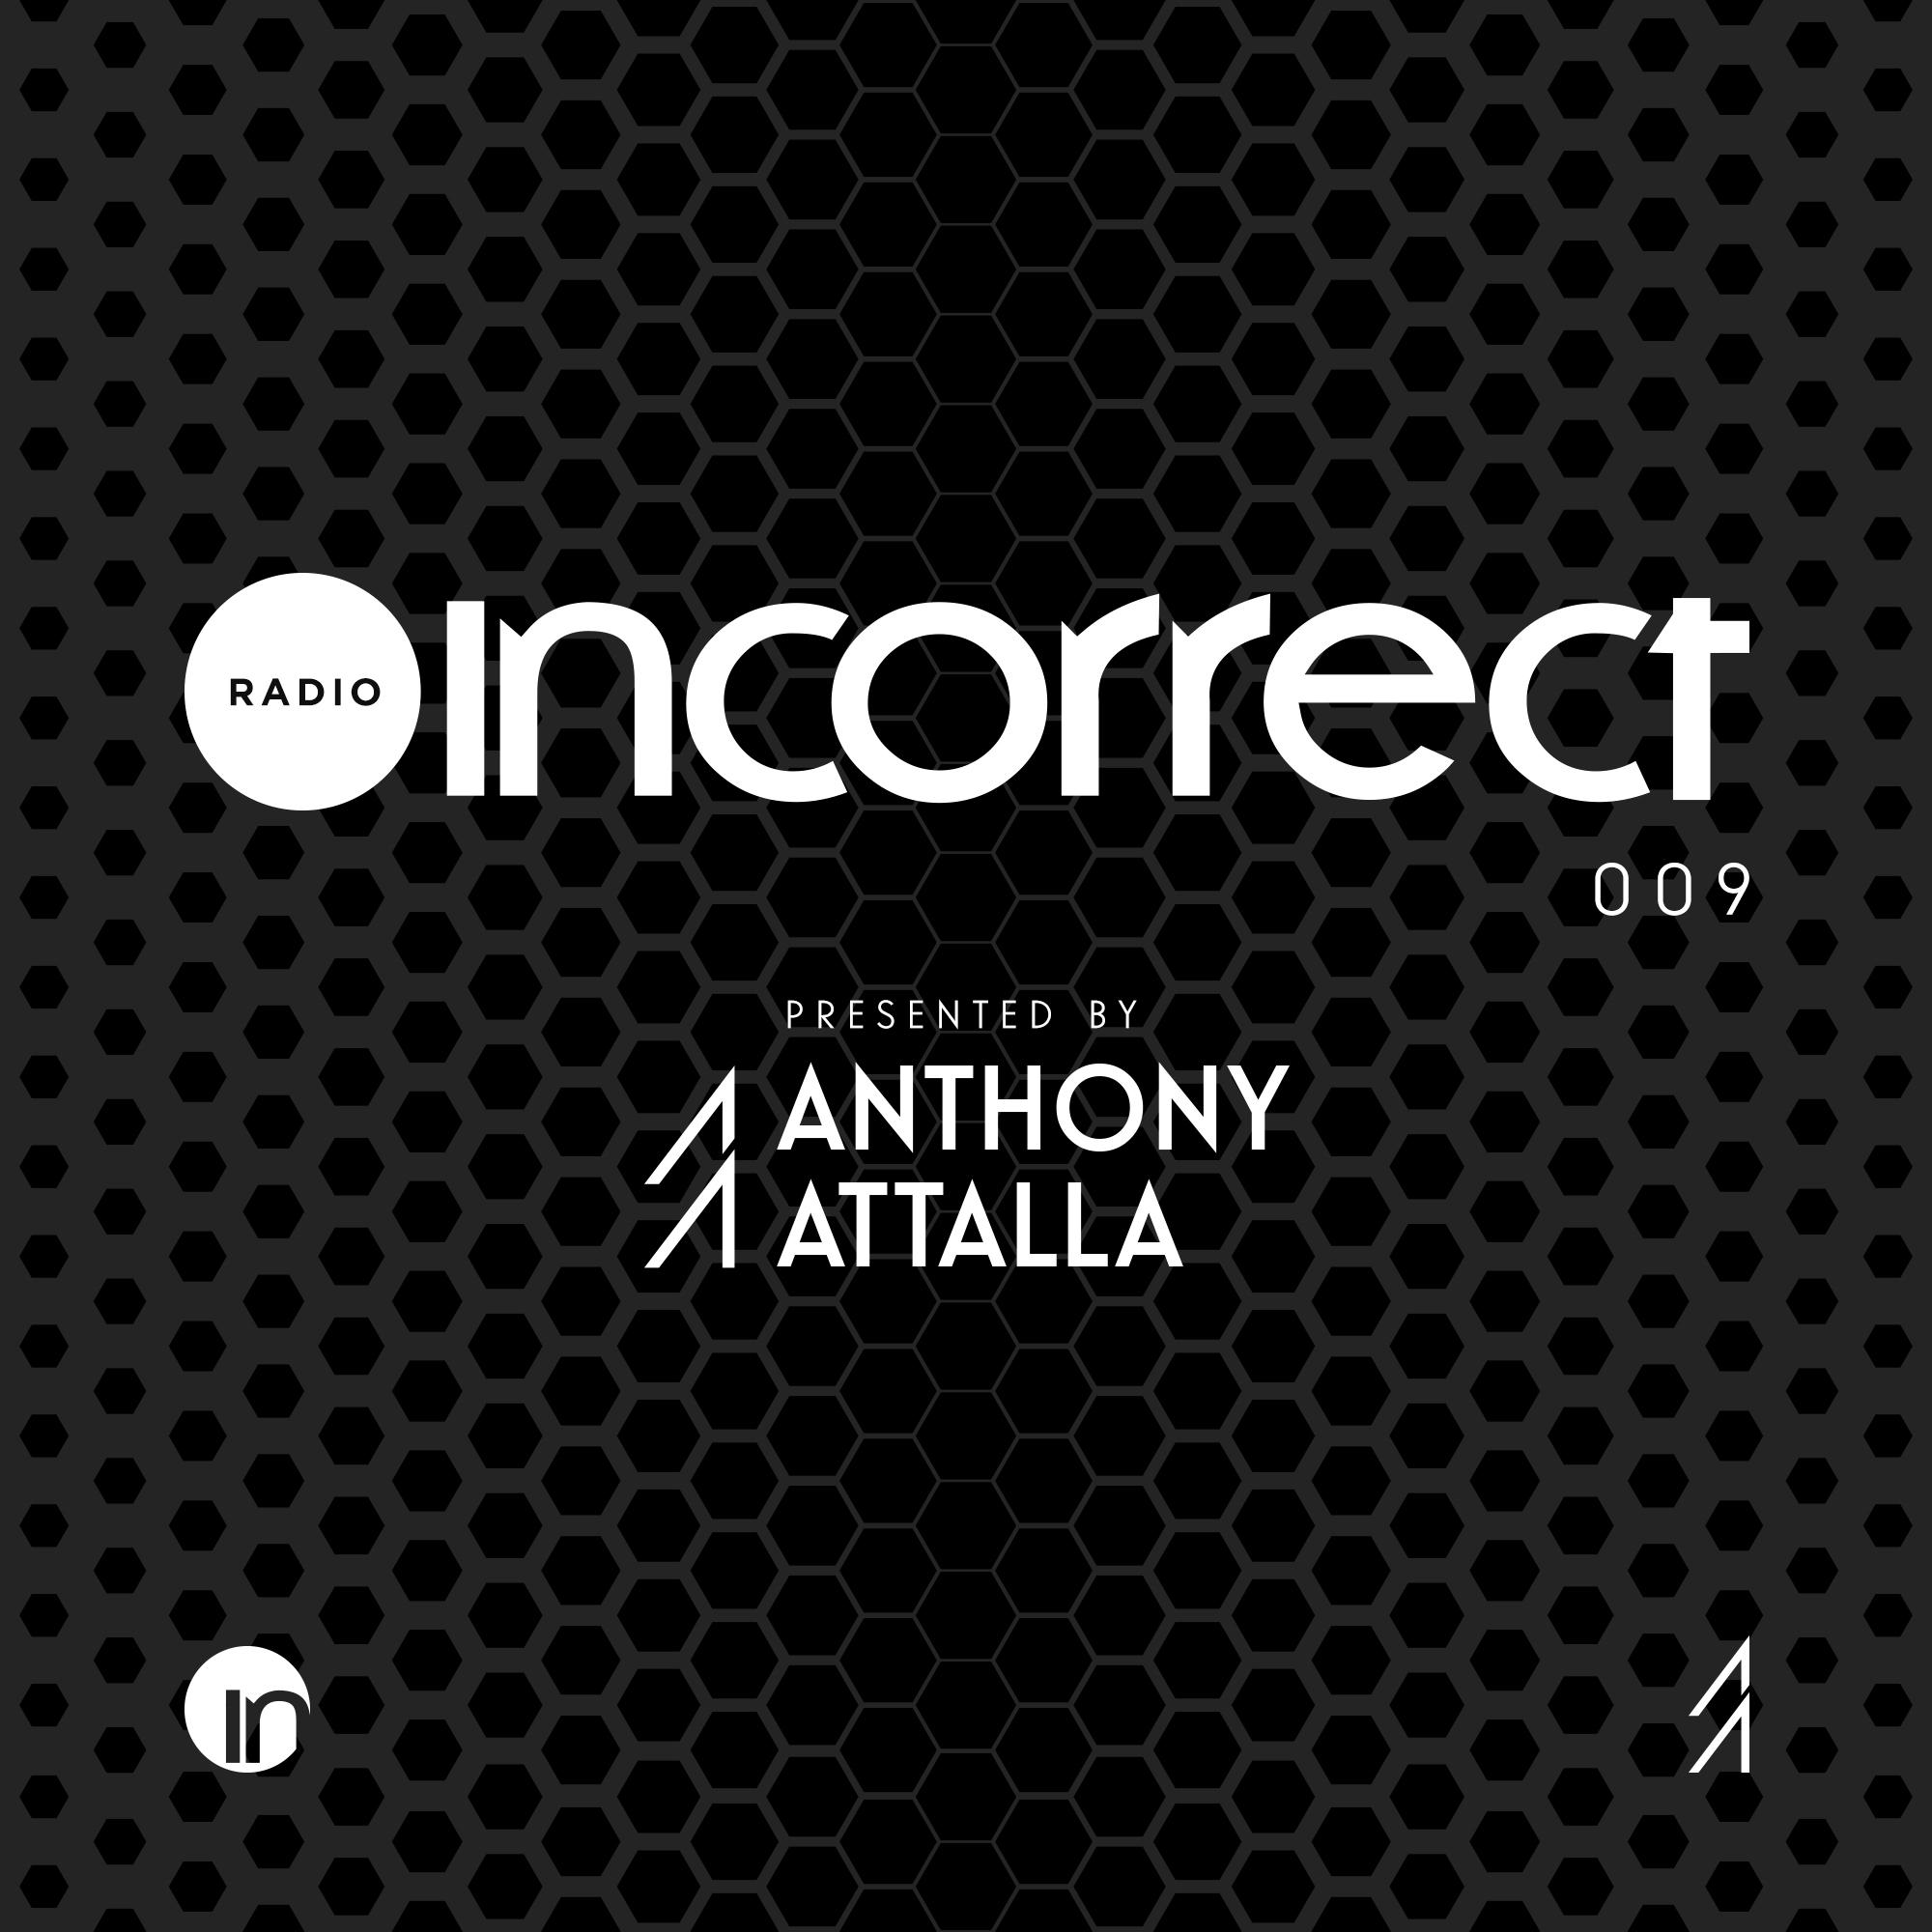 Incorrect Radio - Presented By Anthony Attalla